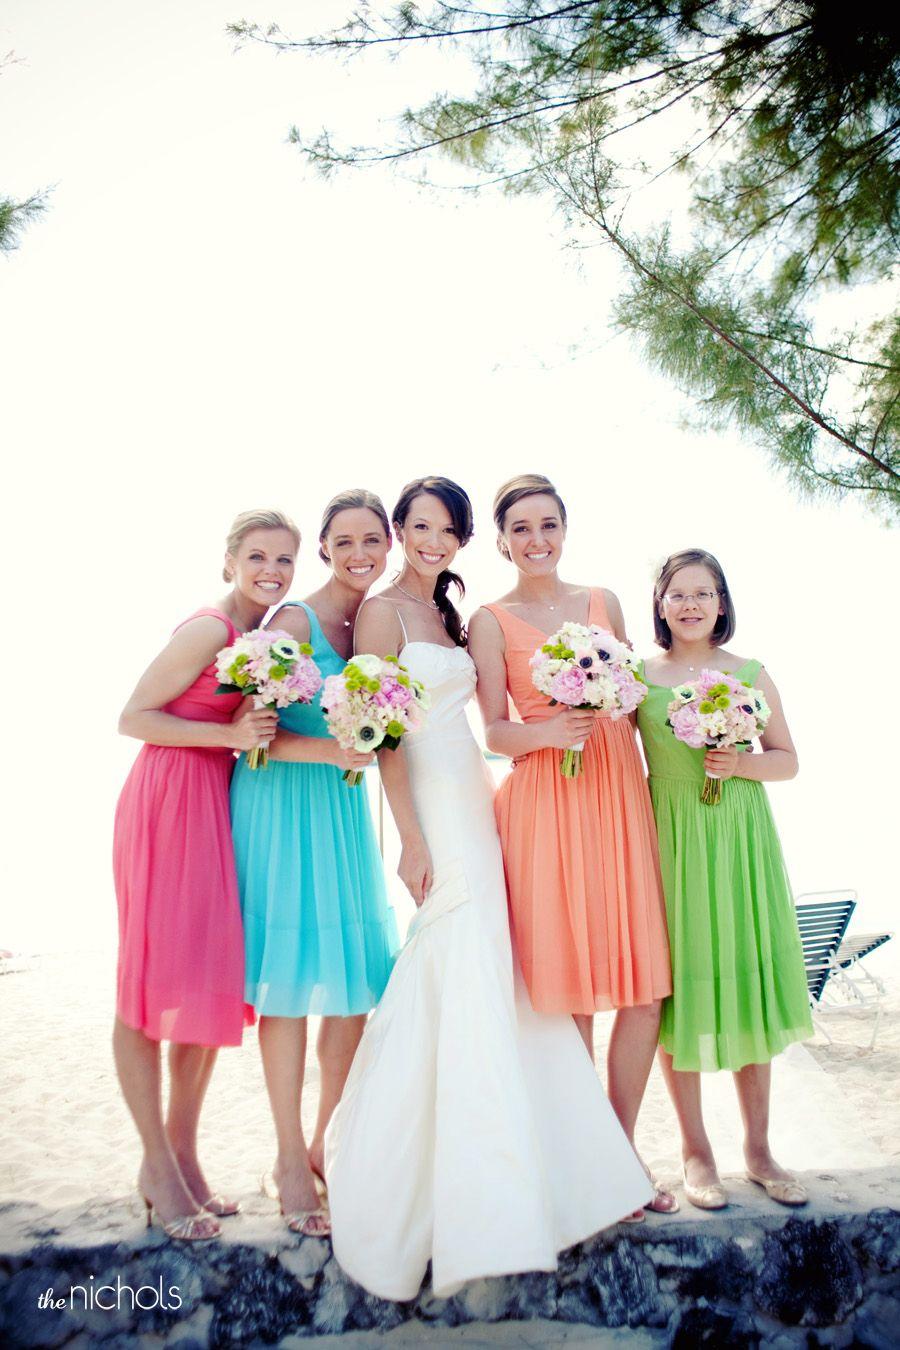 Multi Colored Bridesmaids Bright Bridesmaid Dresses Bridesmaid Bridesmaid Dress Colors